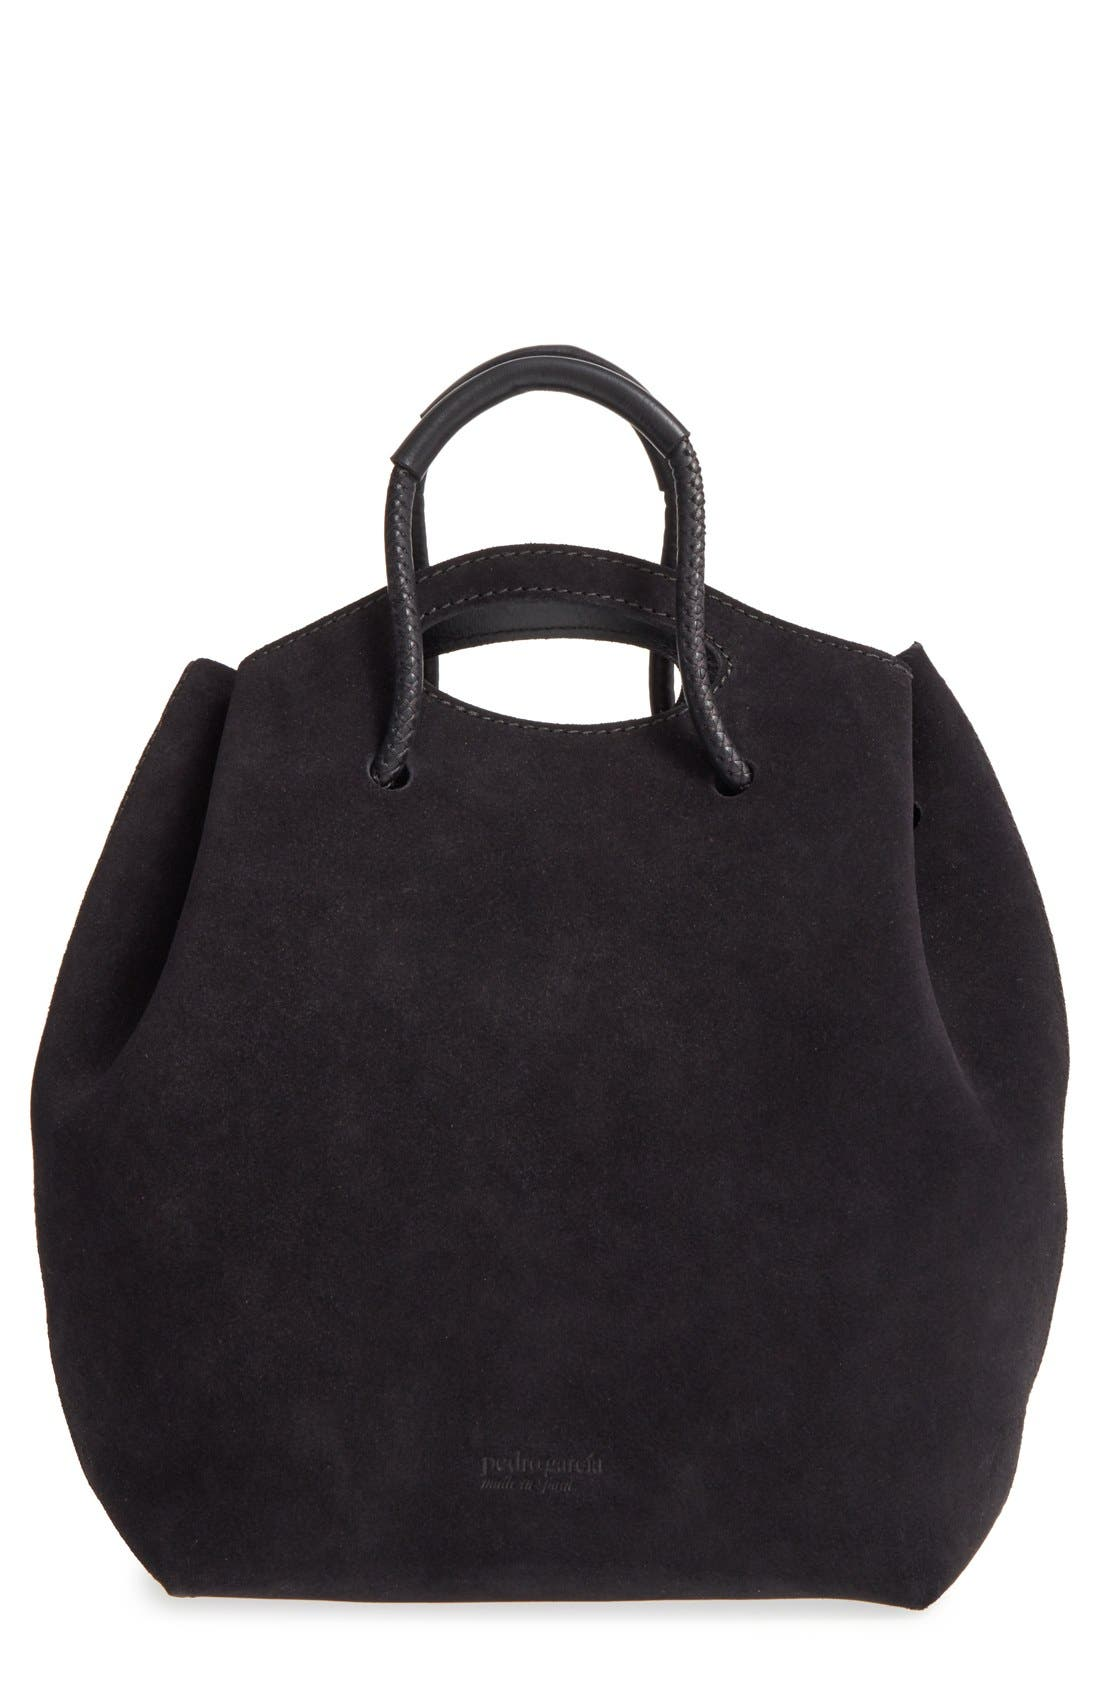 PEDRO GARCIA, Suede Drawstring Bucket Bag, Main thumbnail 1, color, 002